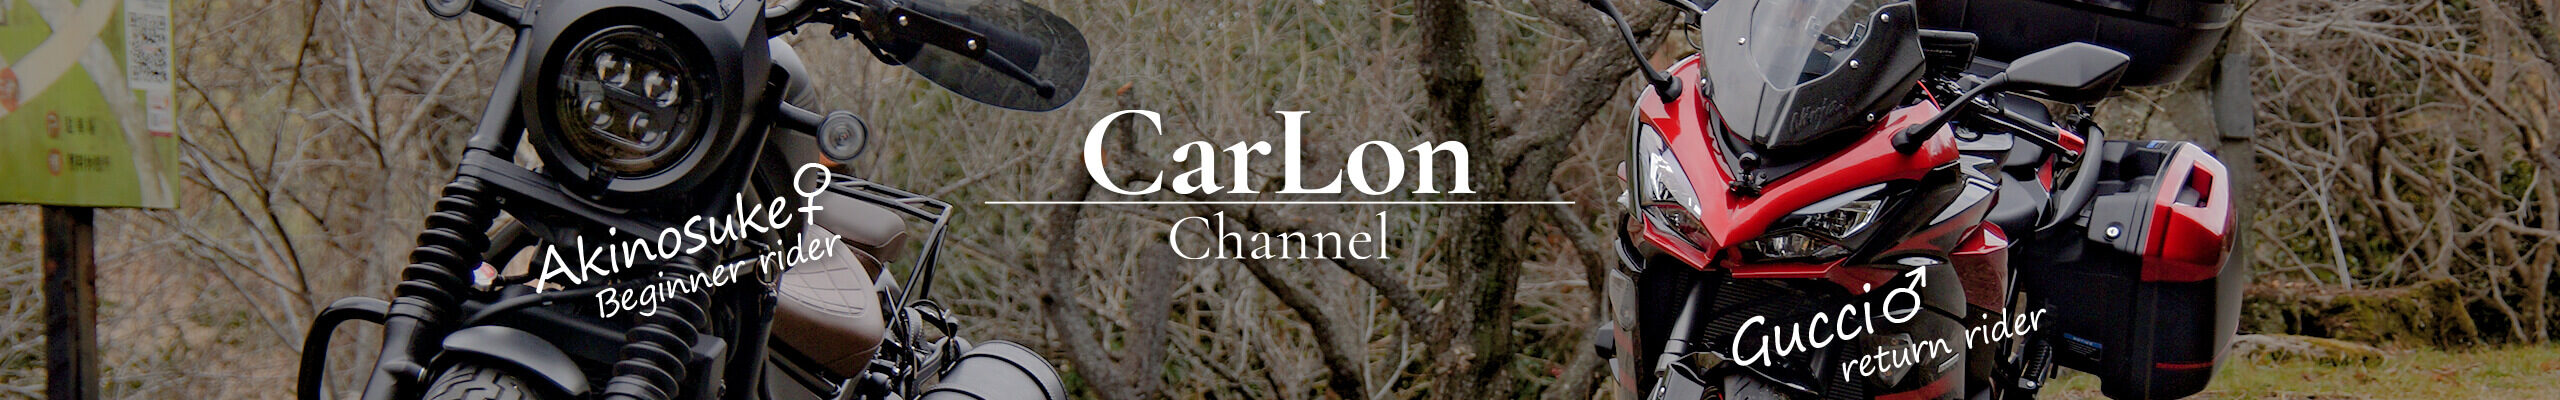 CarLon